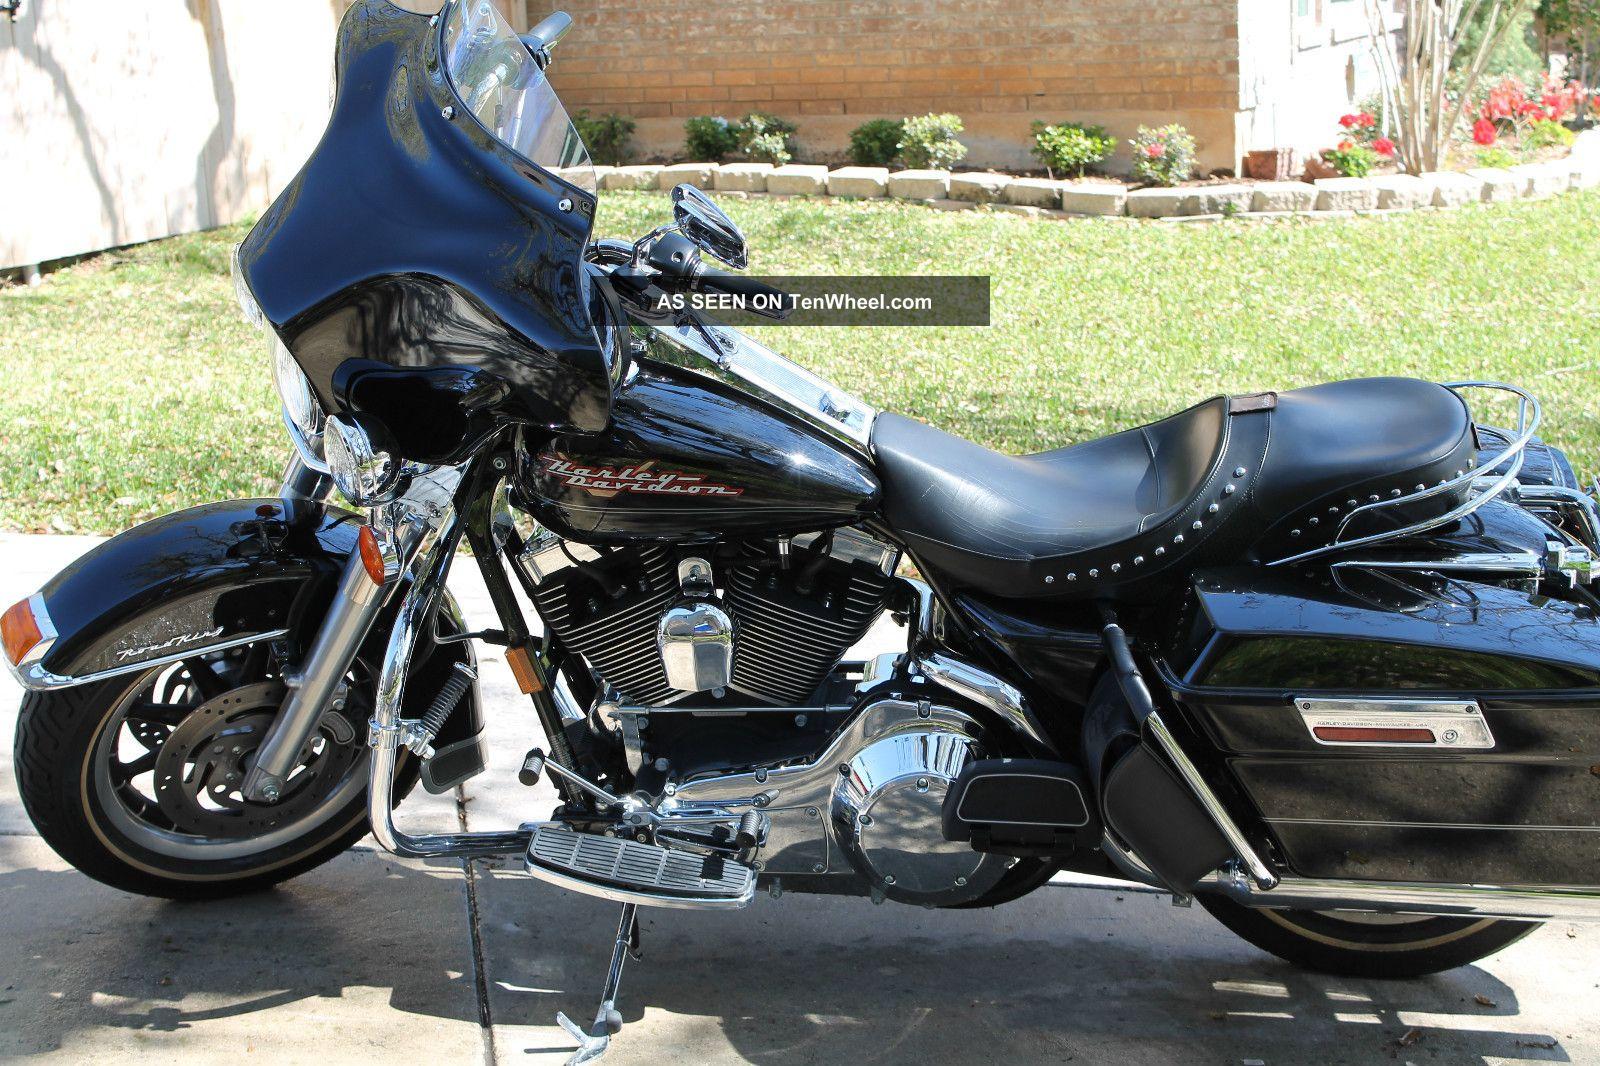 2004 Harley Davidson Road King Flhri